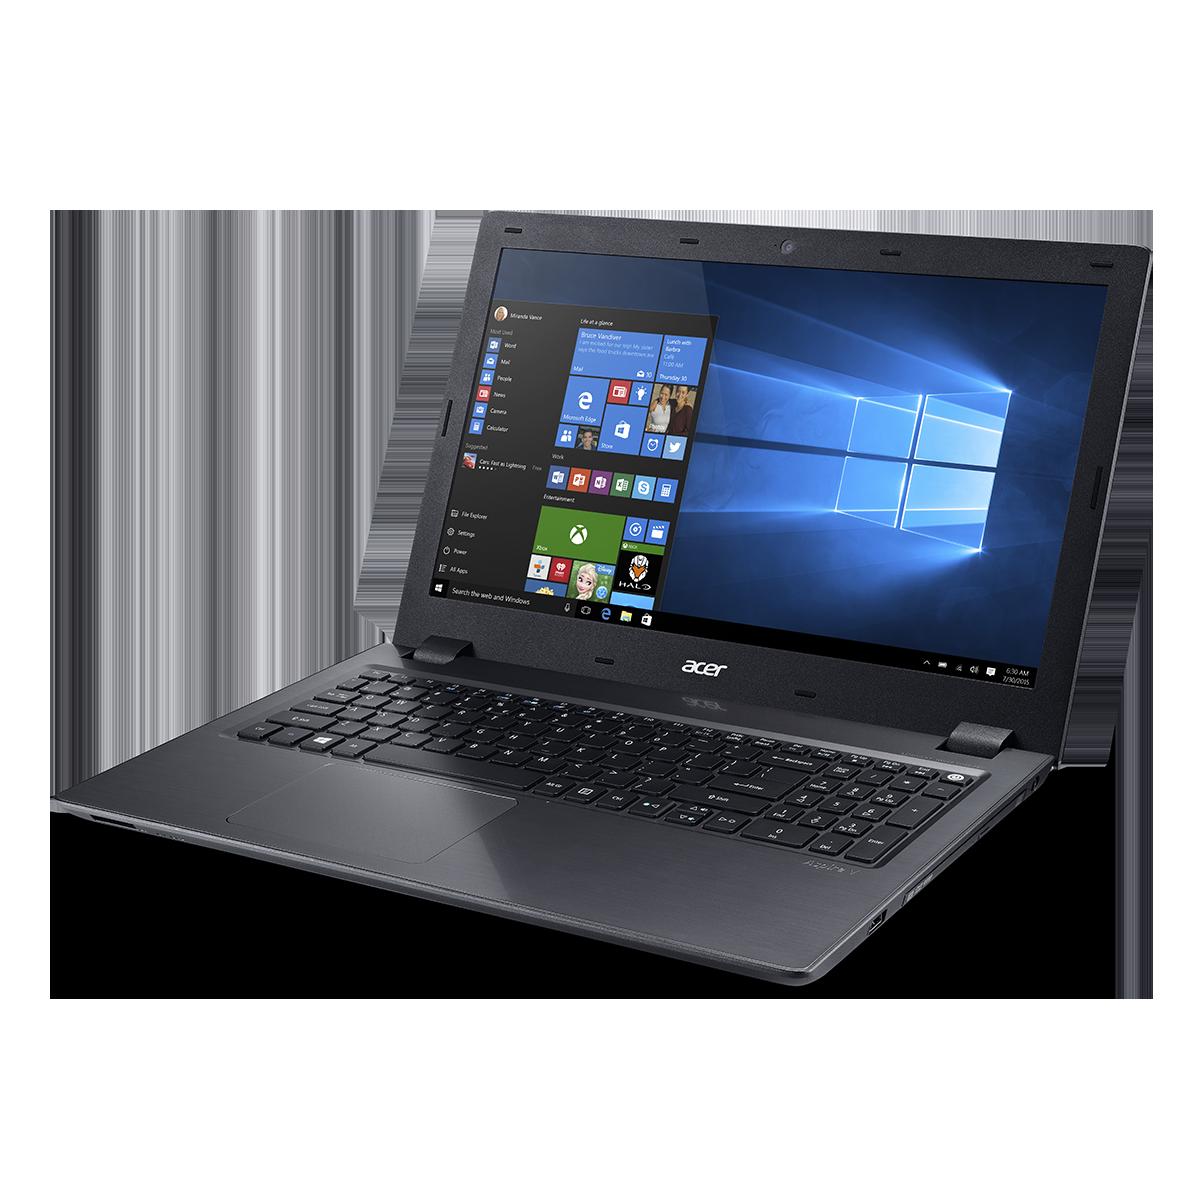 Acer Aspire V 15 Signature Edition Laptop: i7-6500U, 8GB RAM, 1TB HDD  $549 + Free Shipping